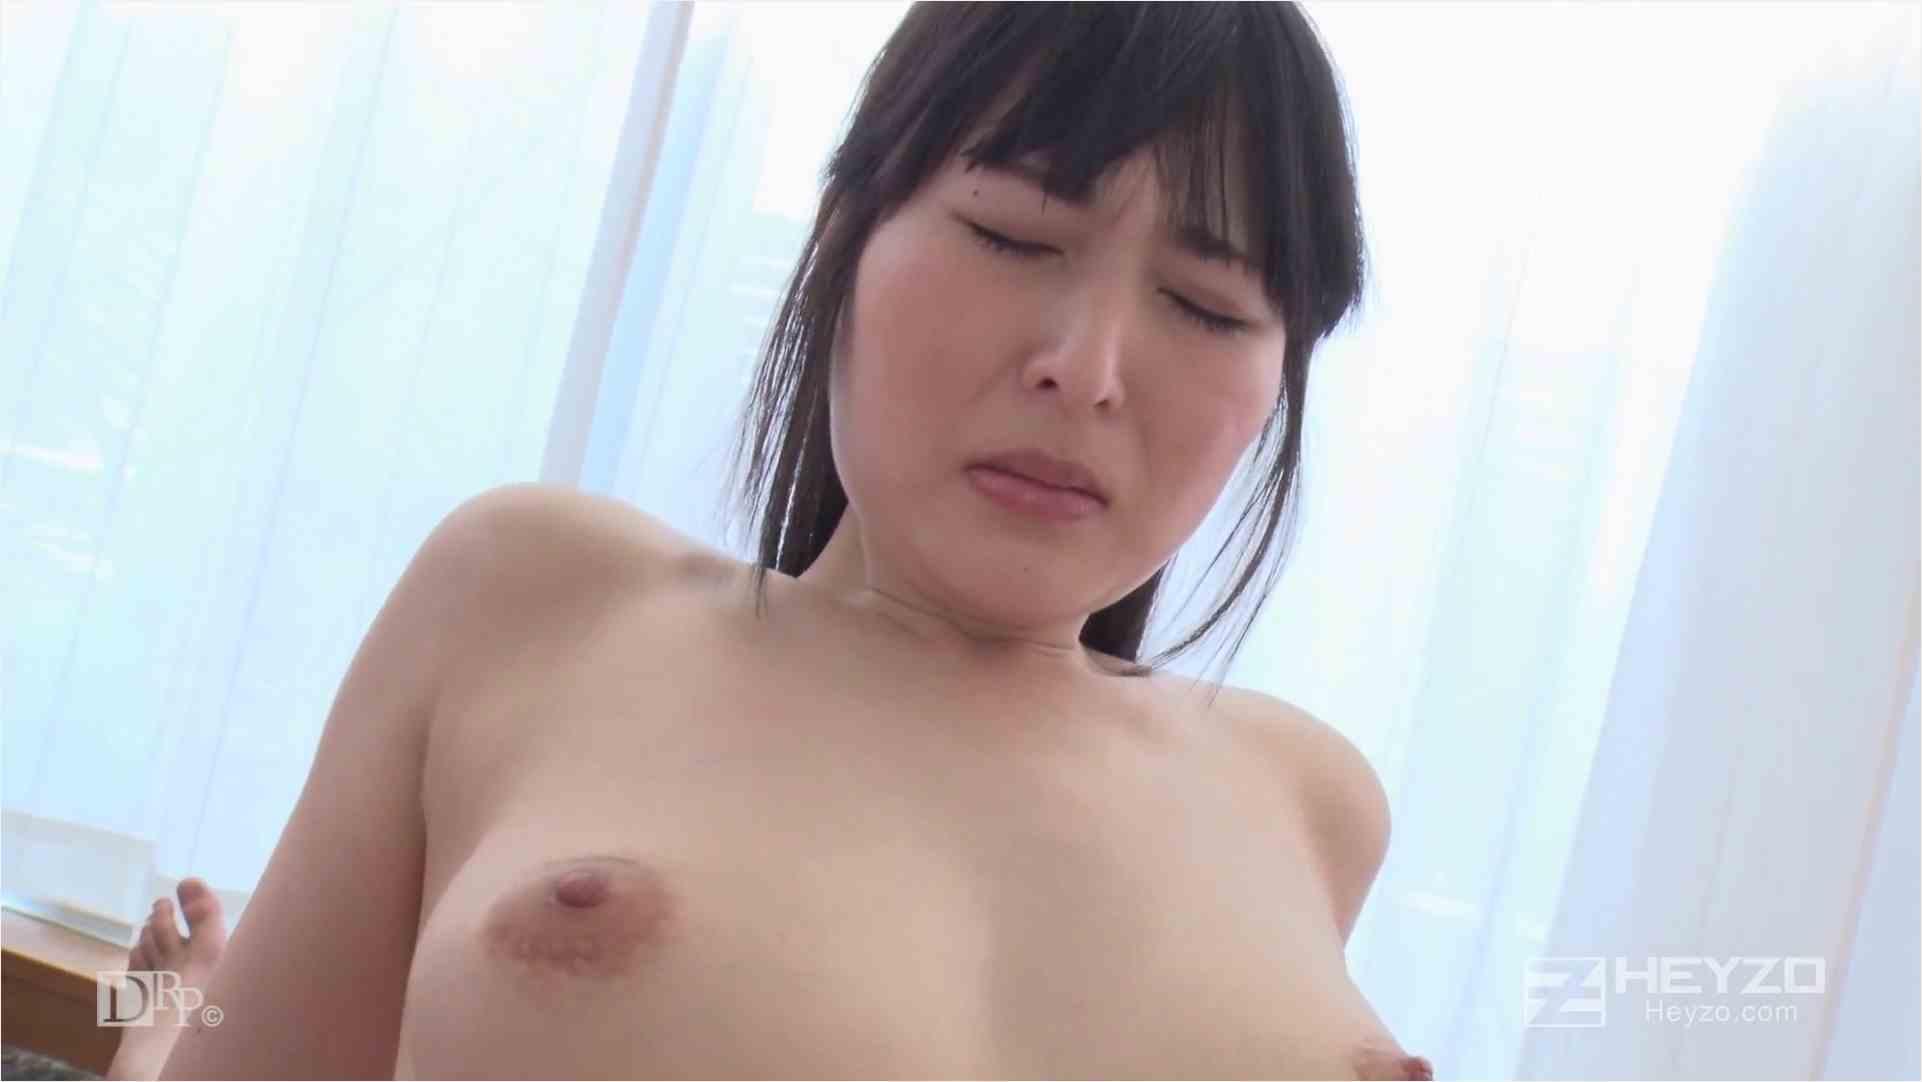 Heyzo-1335-話題の全裸ヨガに潜入!!~気持ち良すぎてヌレヌレ~